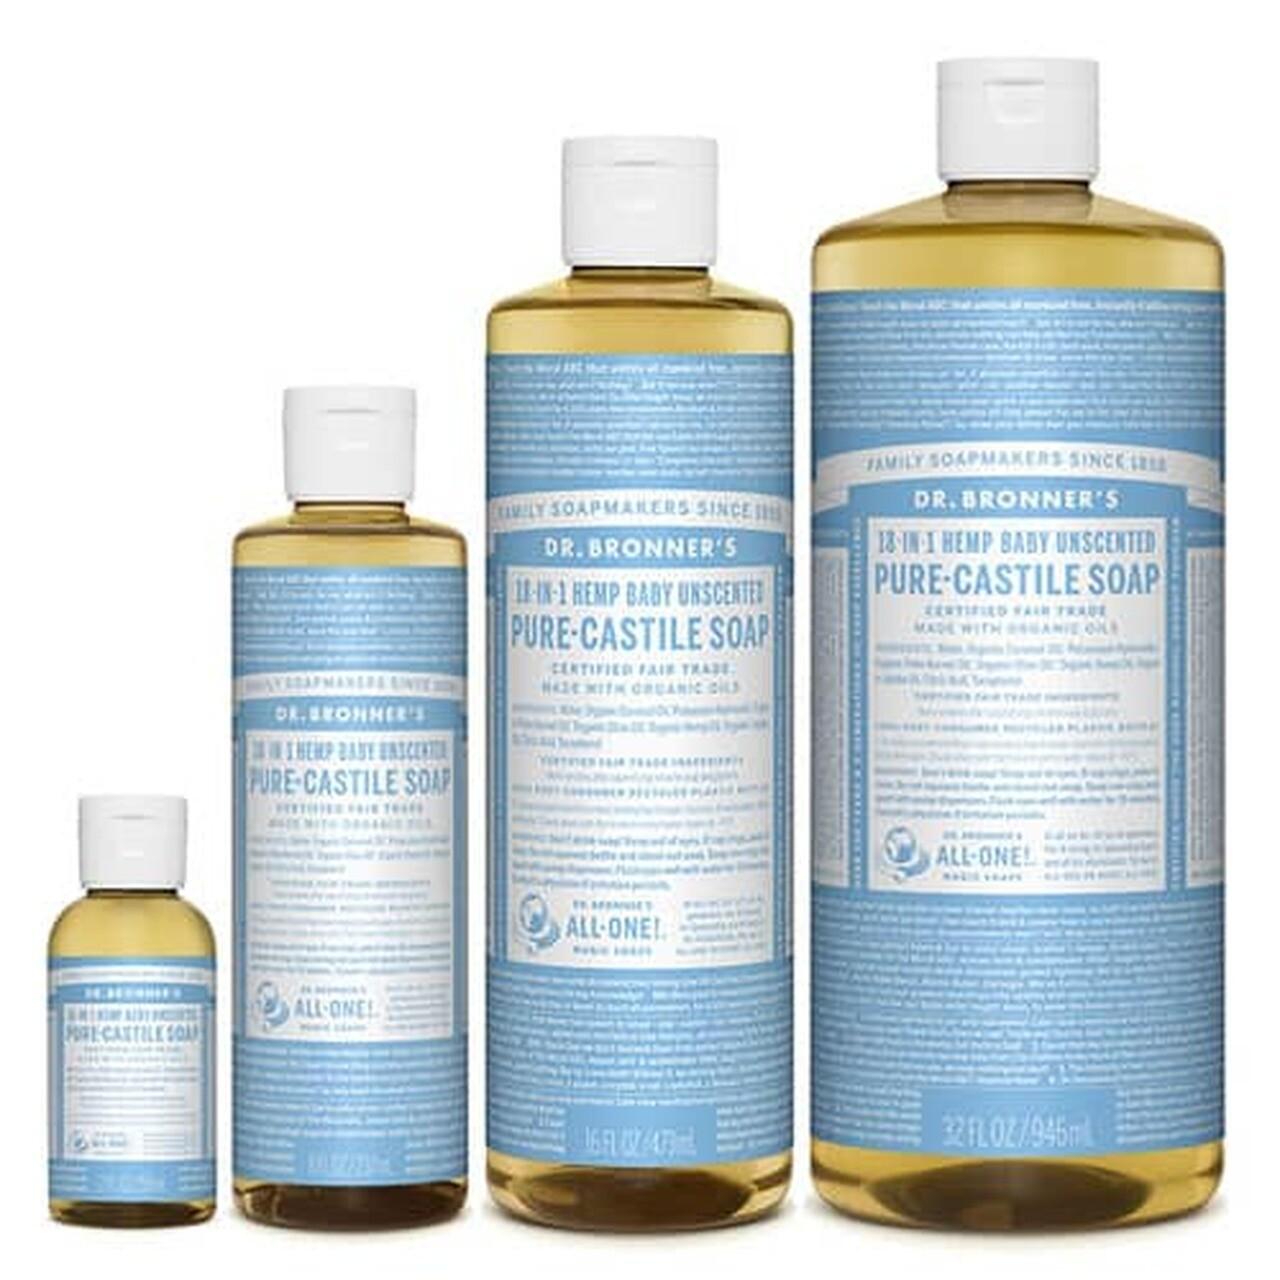 Dr Bronner's Pure Castile Liquid Soap